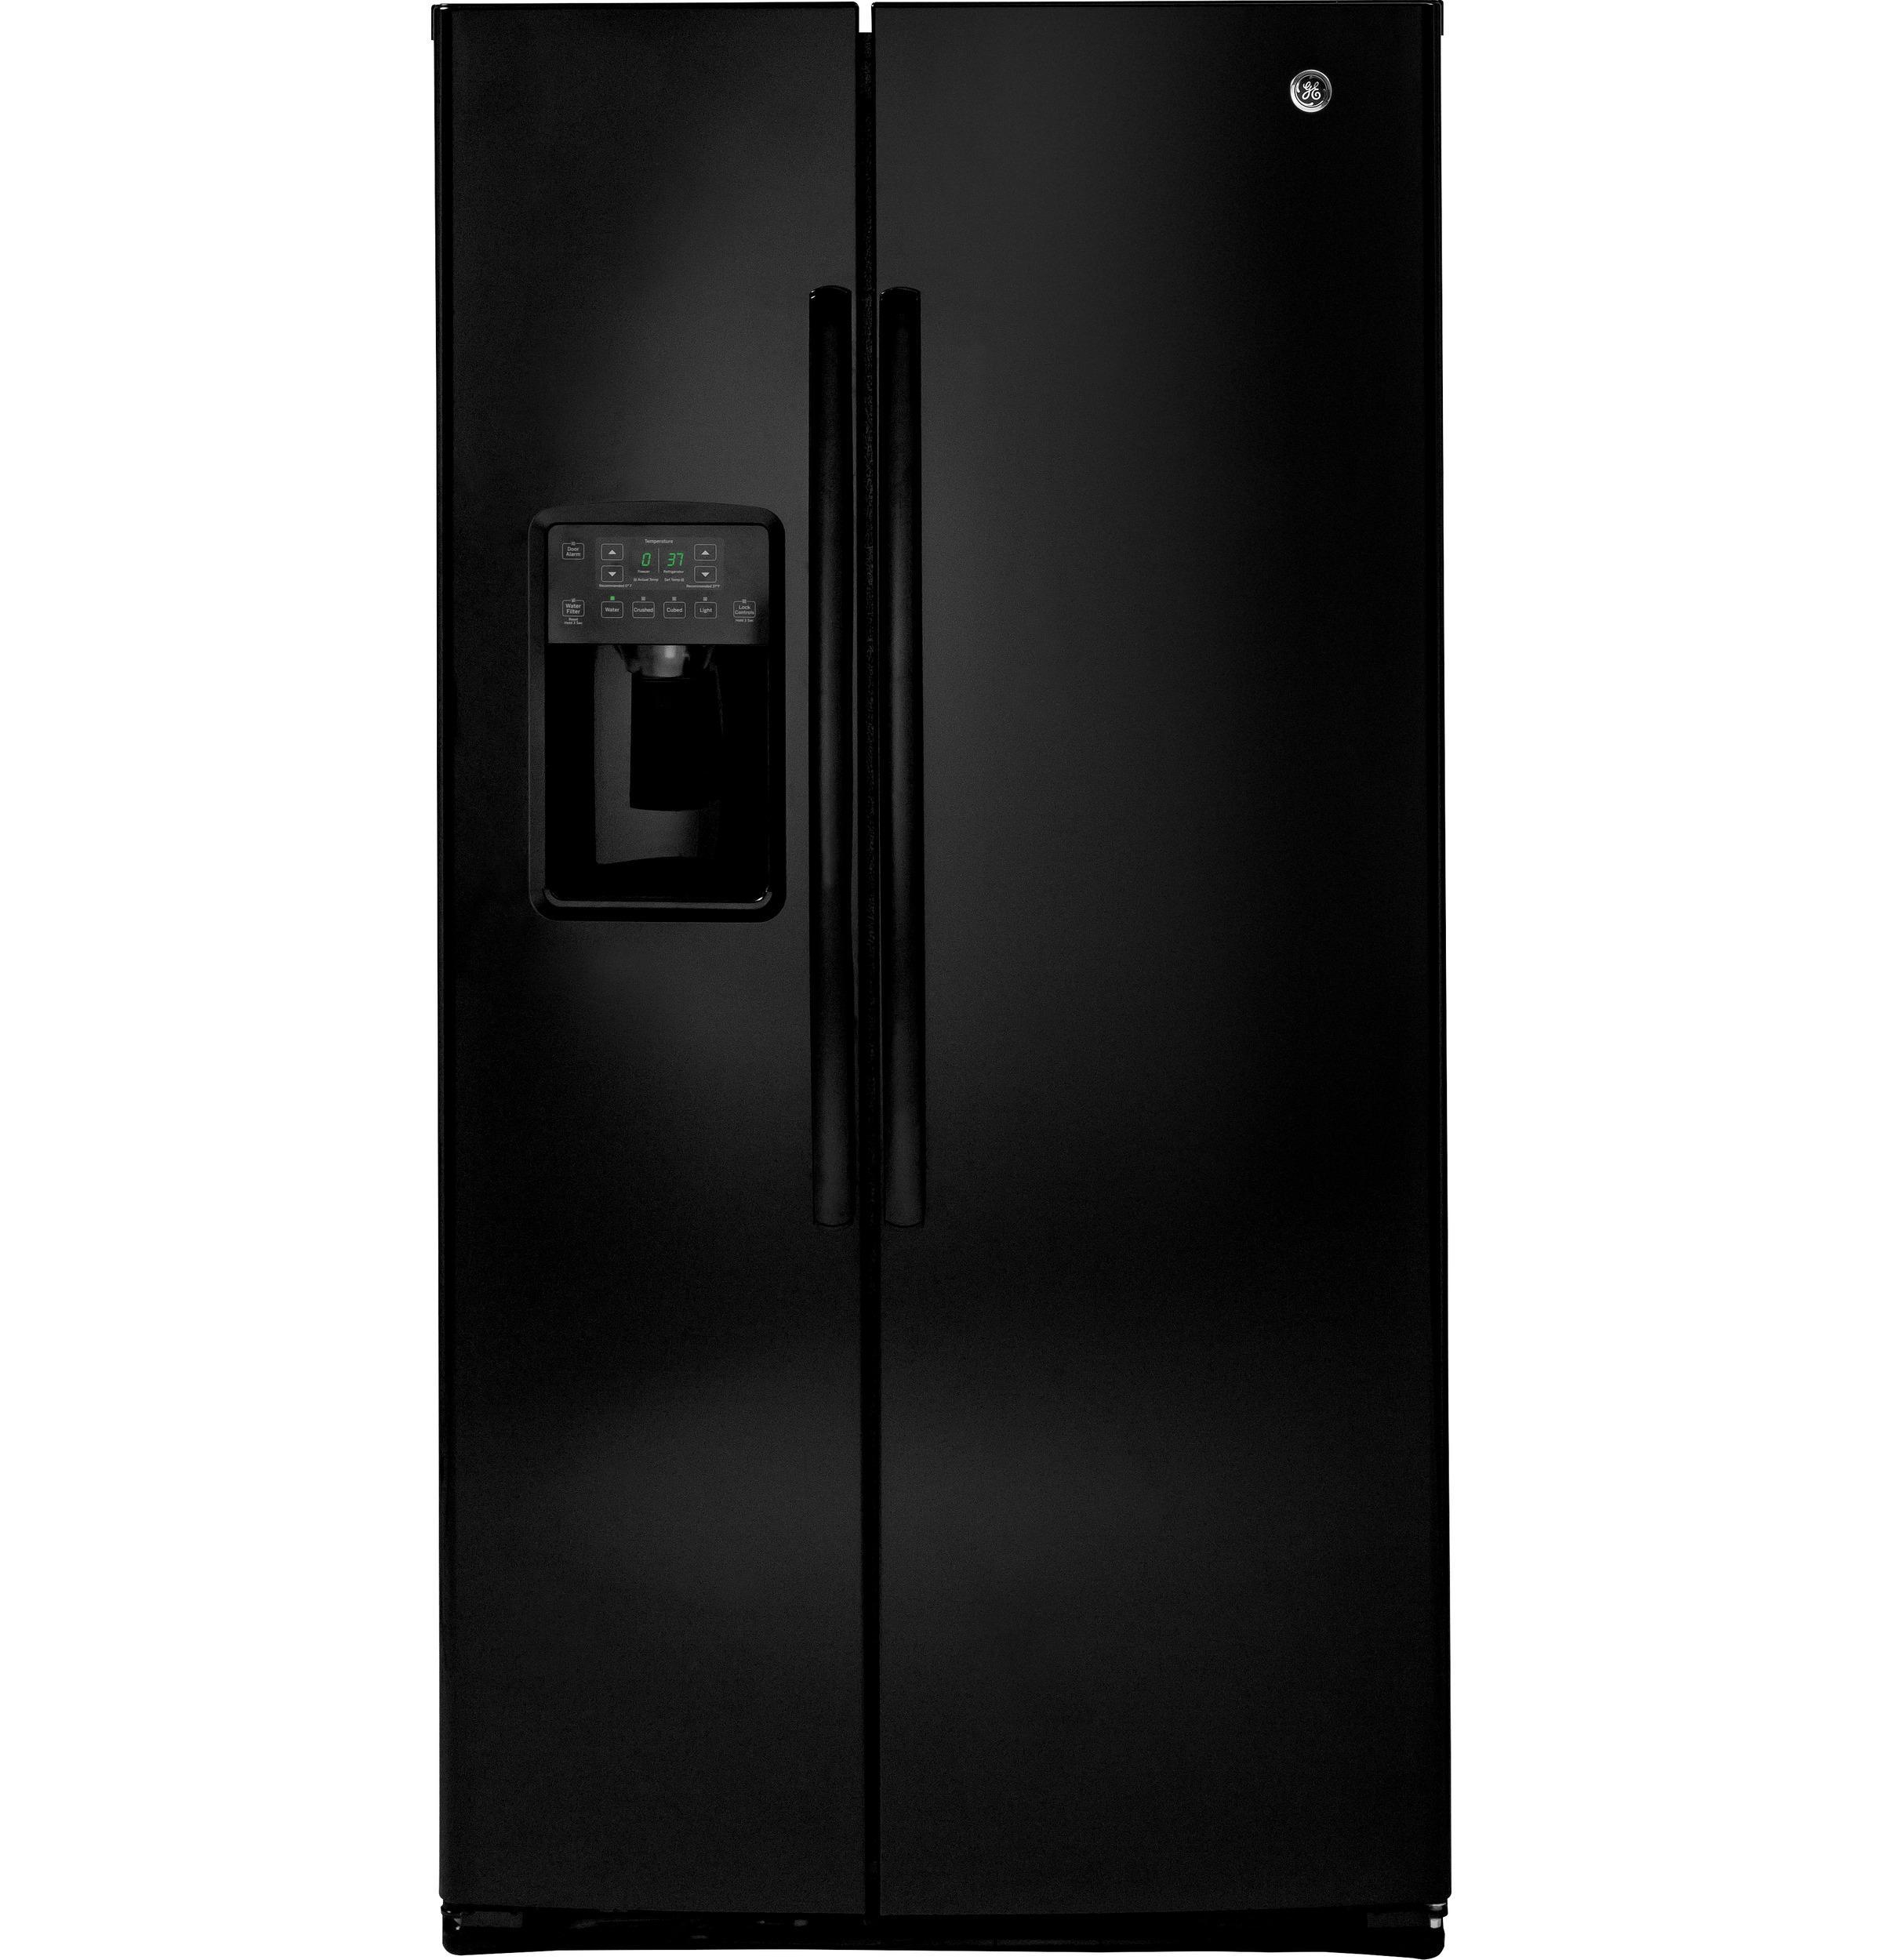 GE(R) ENERGY STAR(R) 25.3 Cu. Ft. Side-By-Side Refrigerator  BLACK